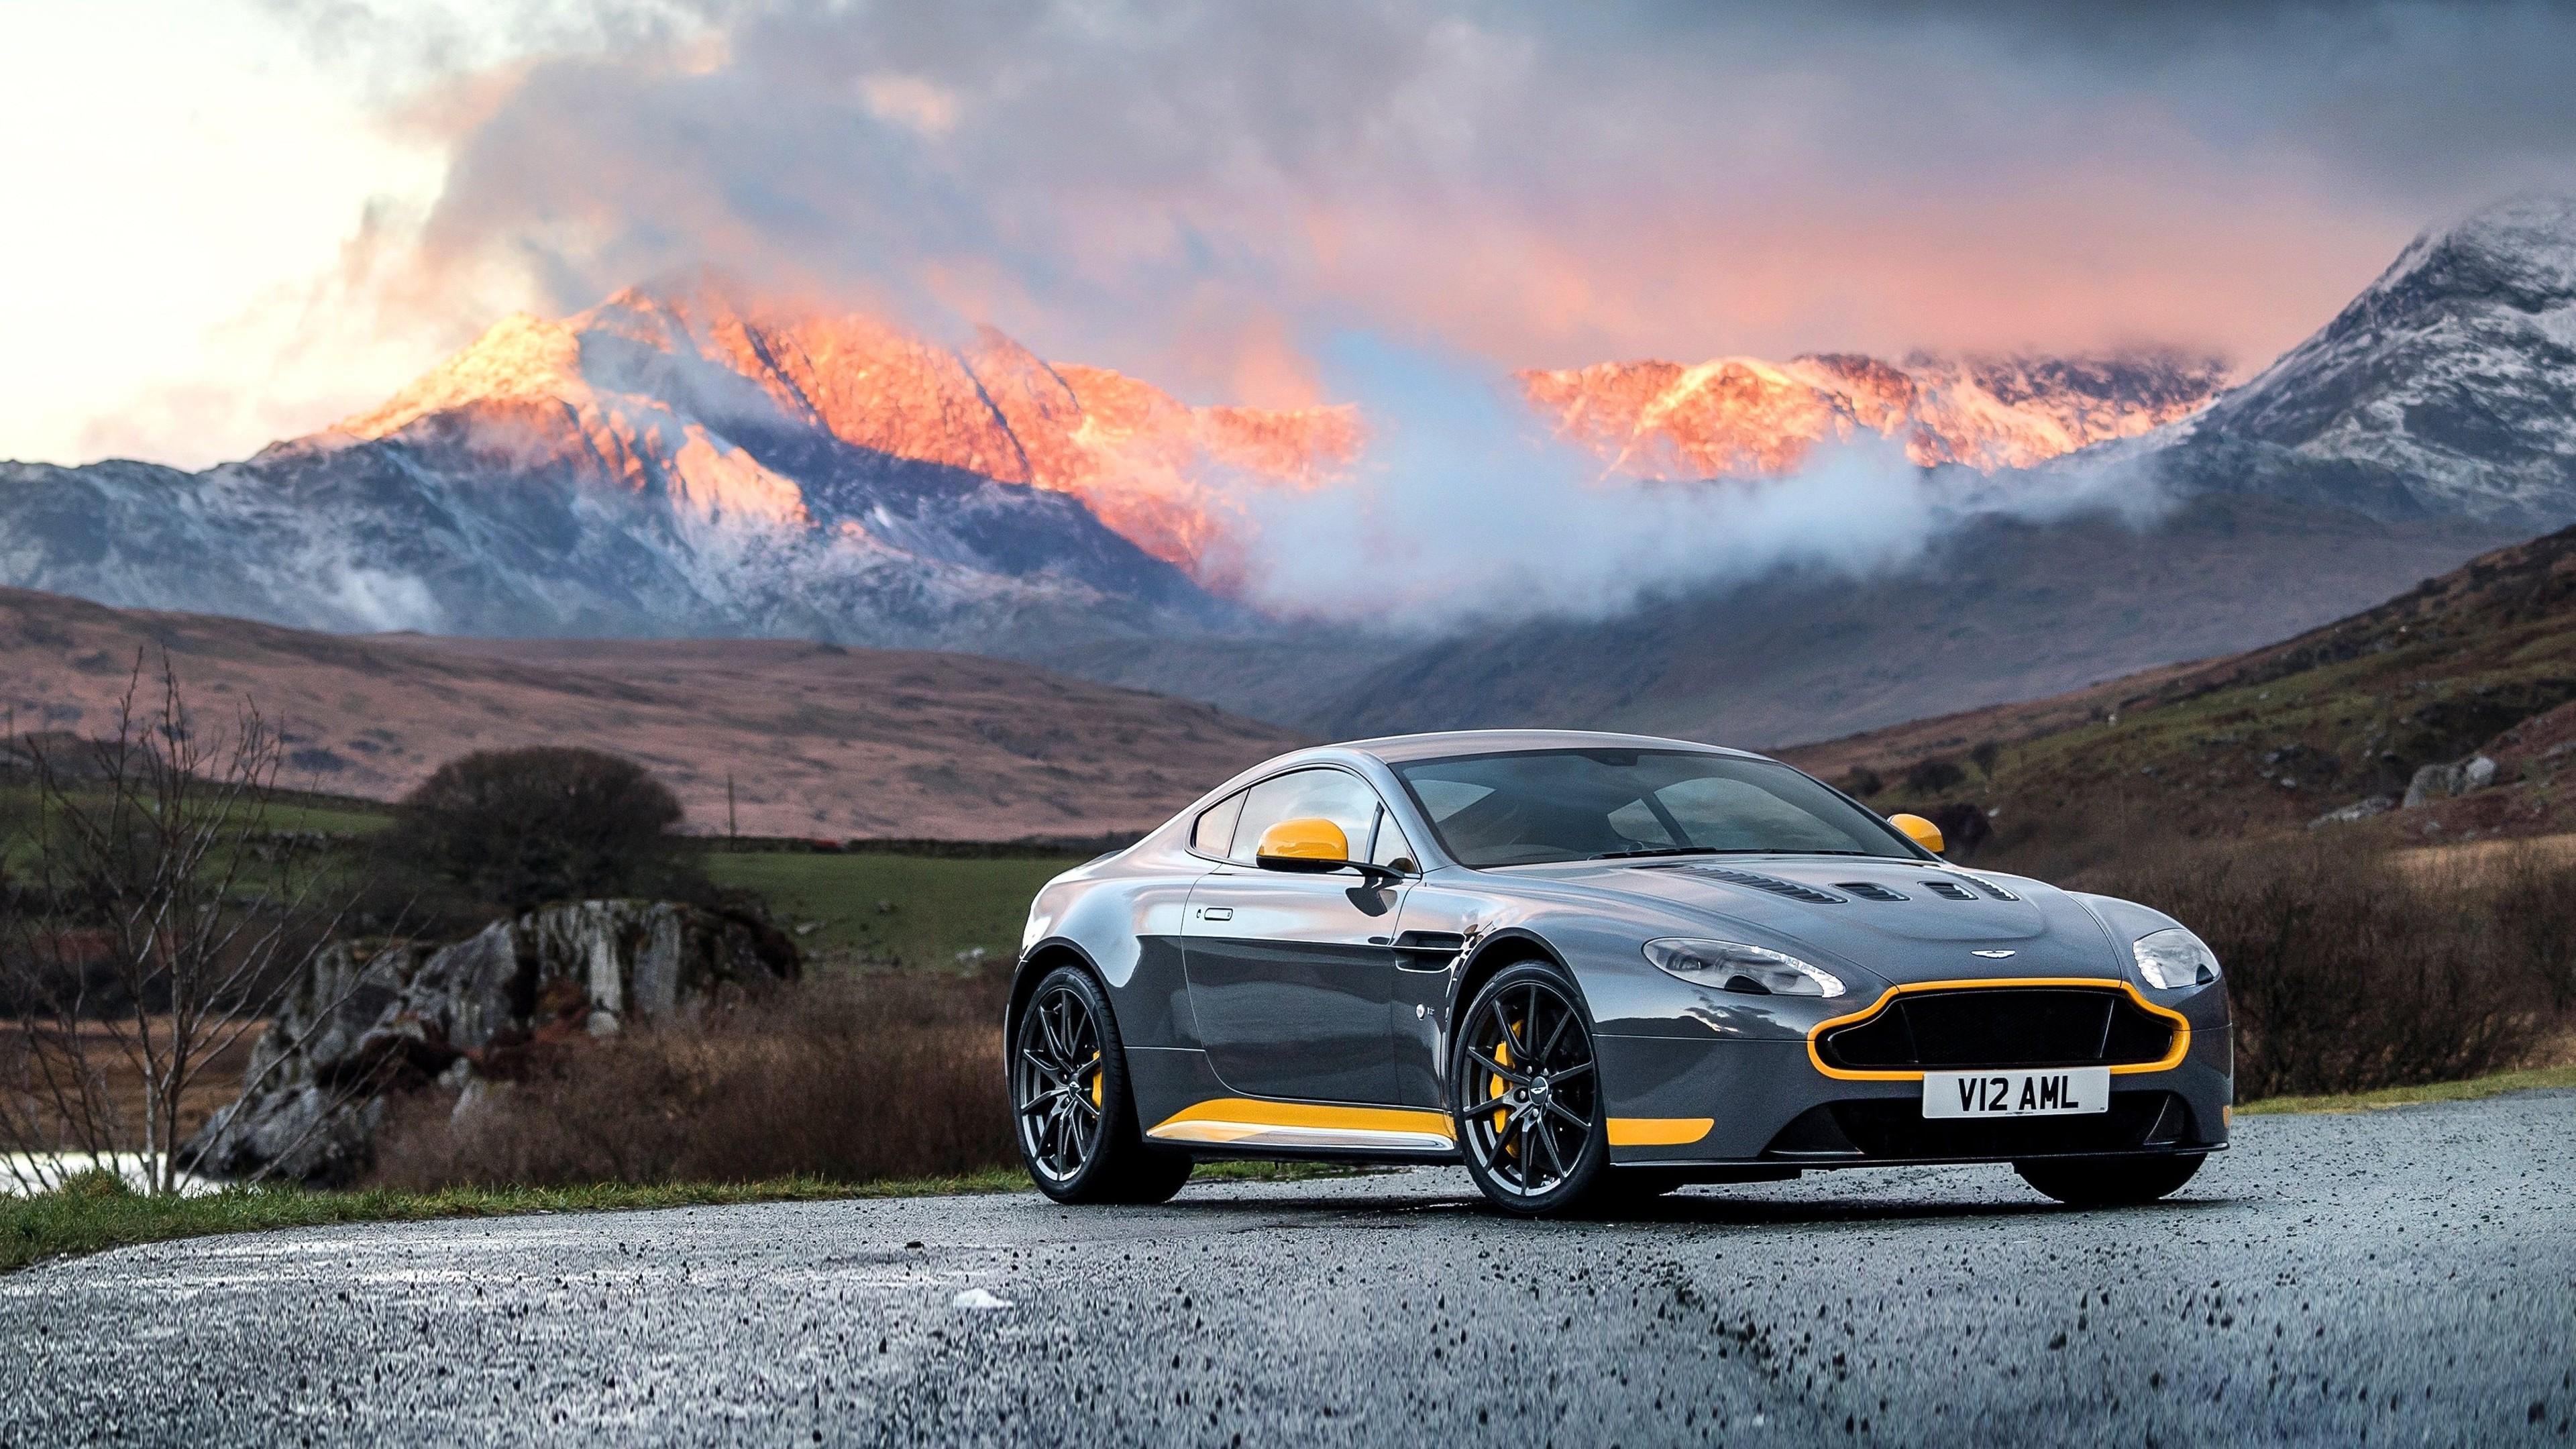 Aston Martin U2013 Sports Cars HD Wallpapers